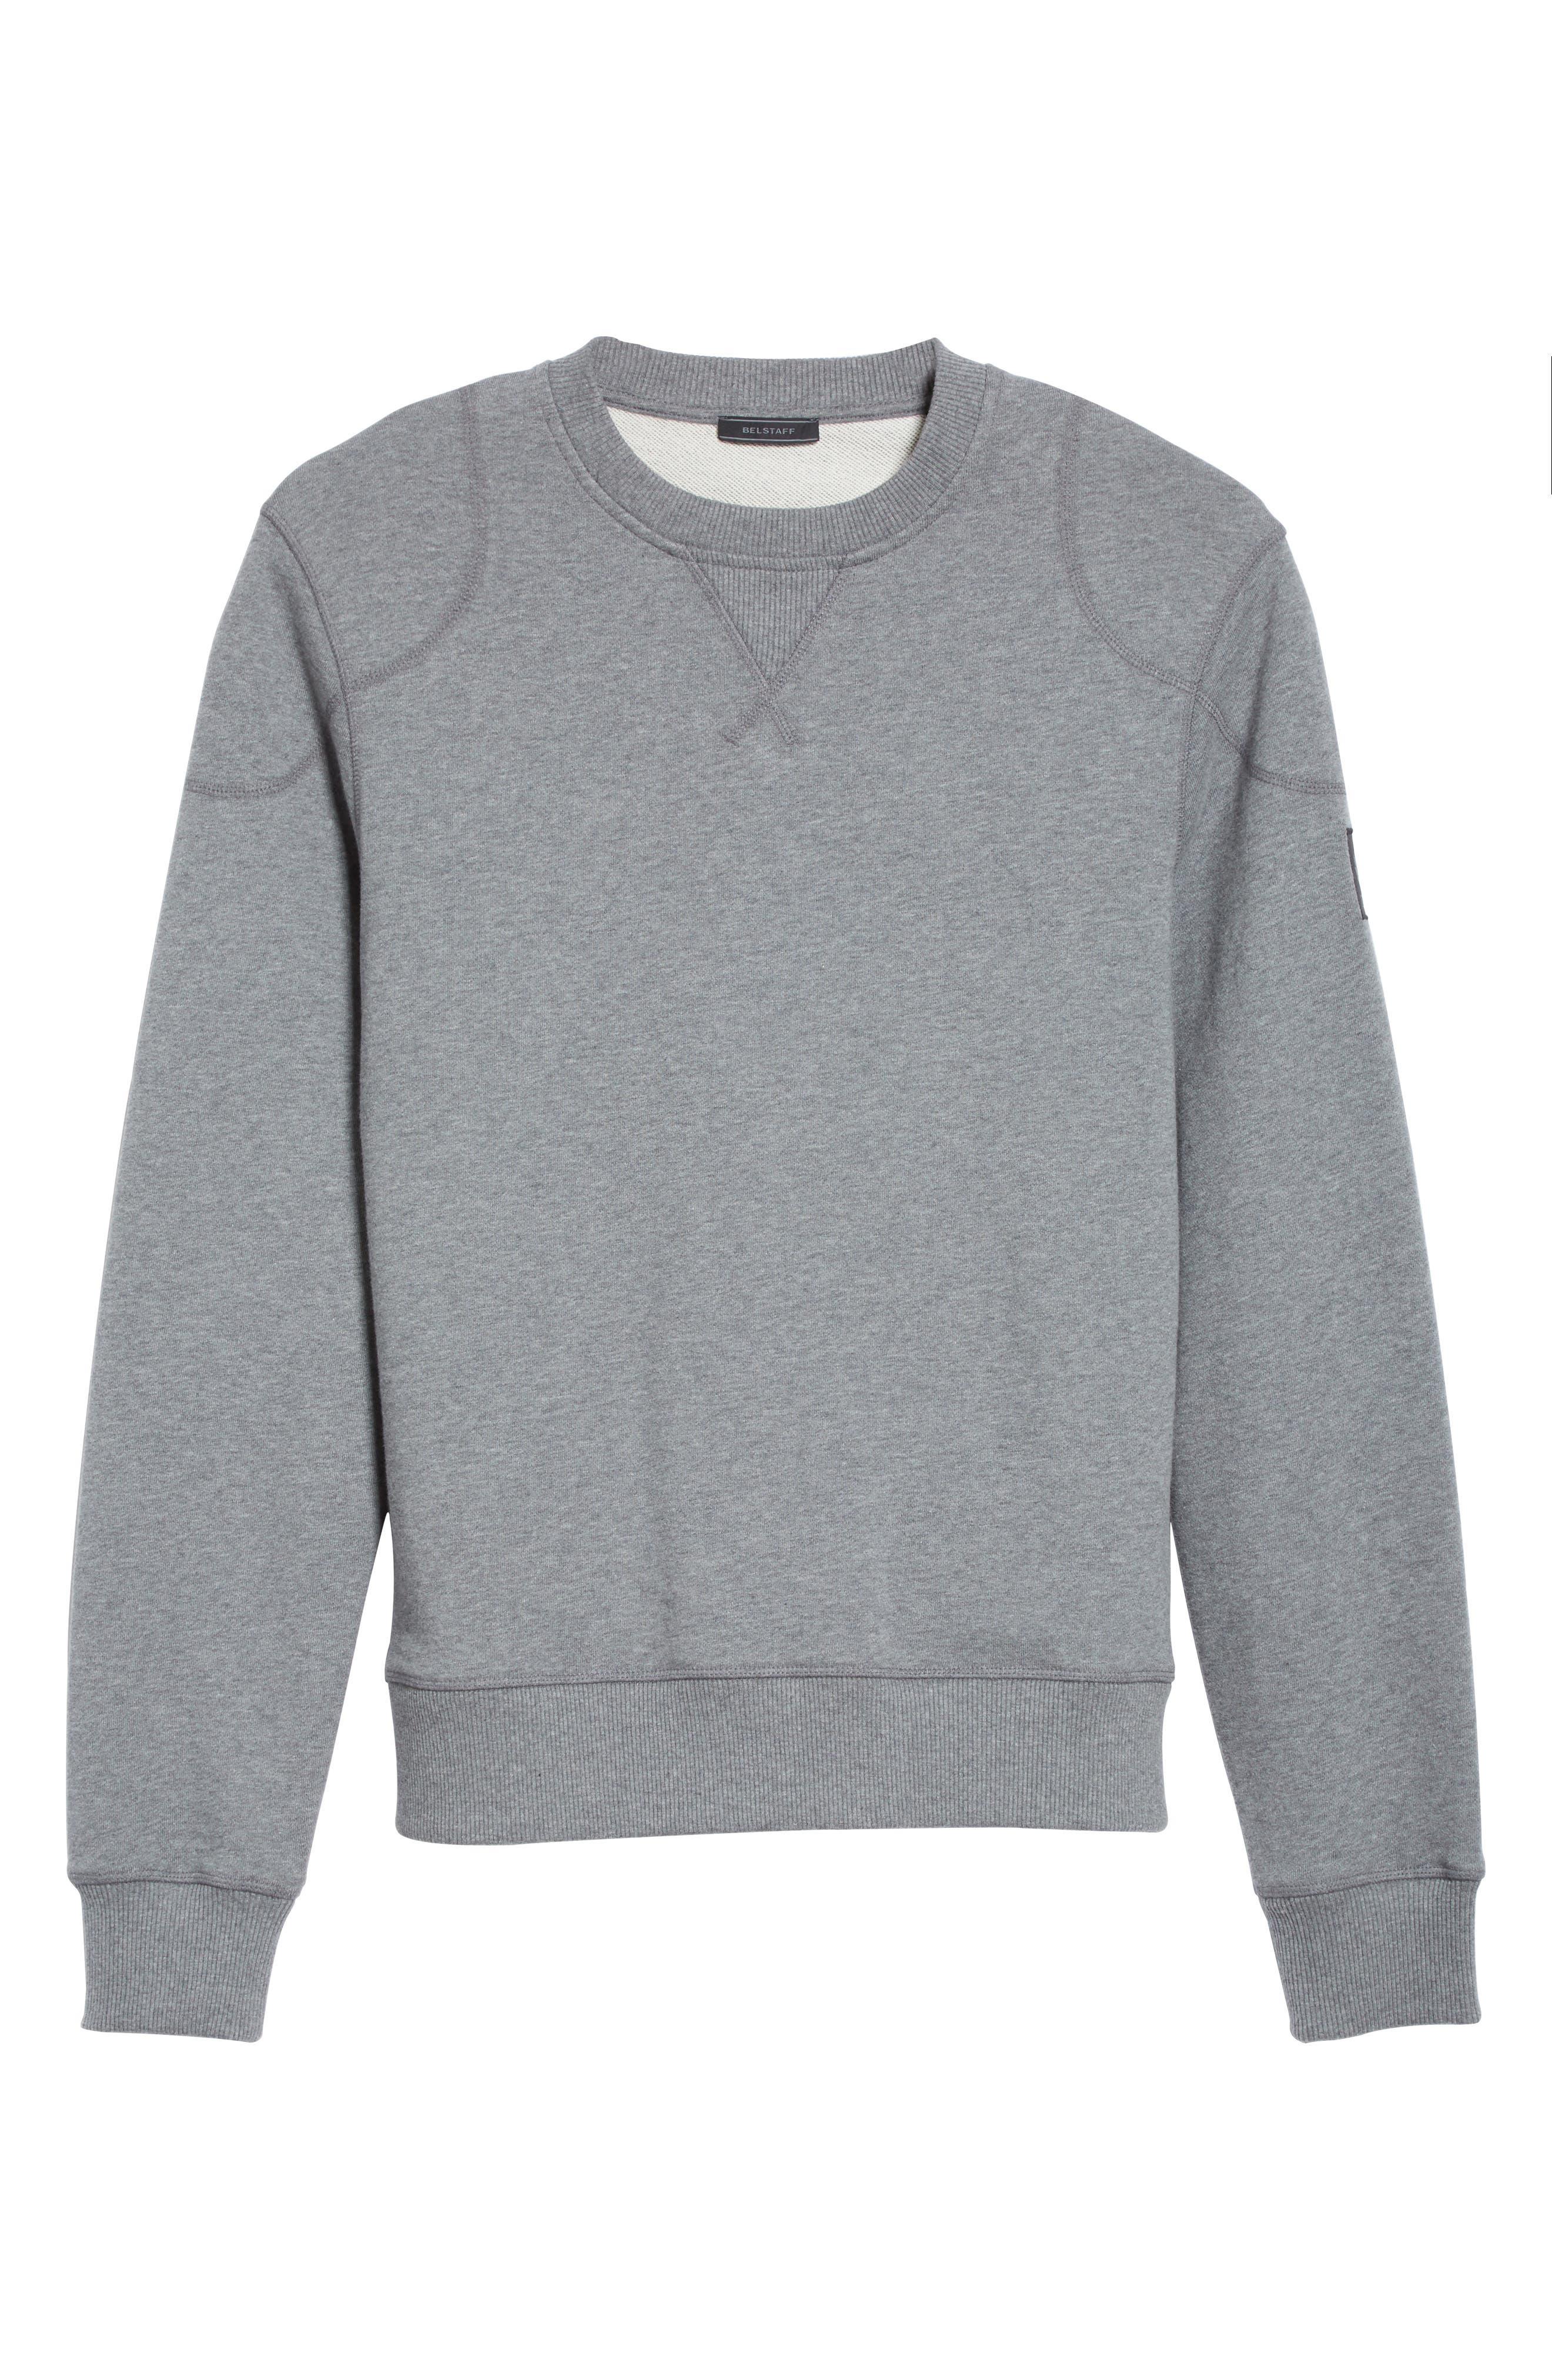 Jefferson Fleece Sweatshirt,                             Alternate thumbnail 6, color,                             Dark Grey Mel